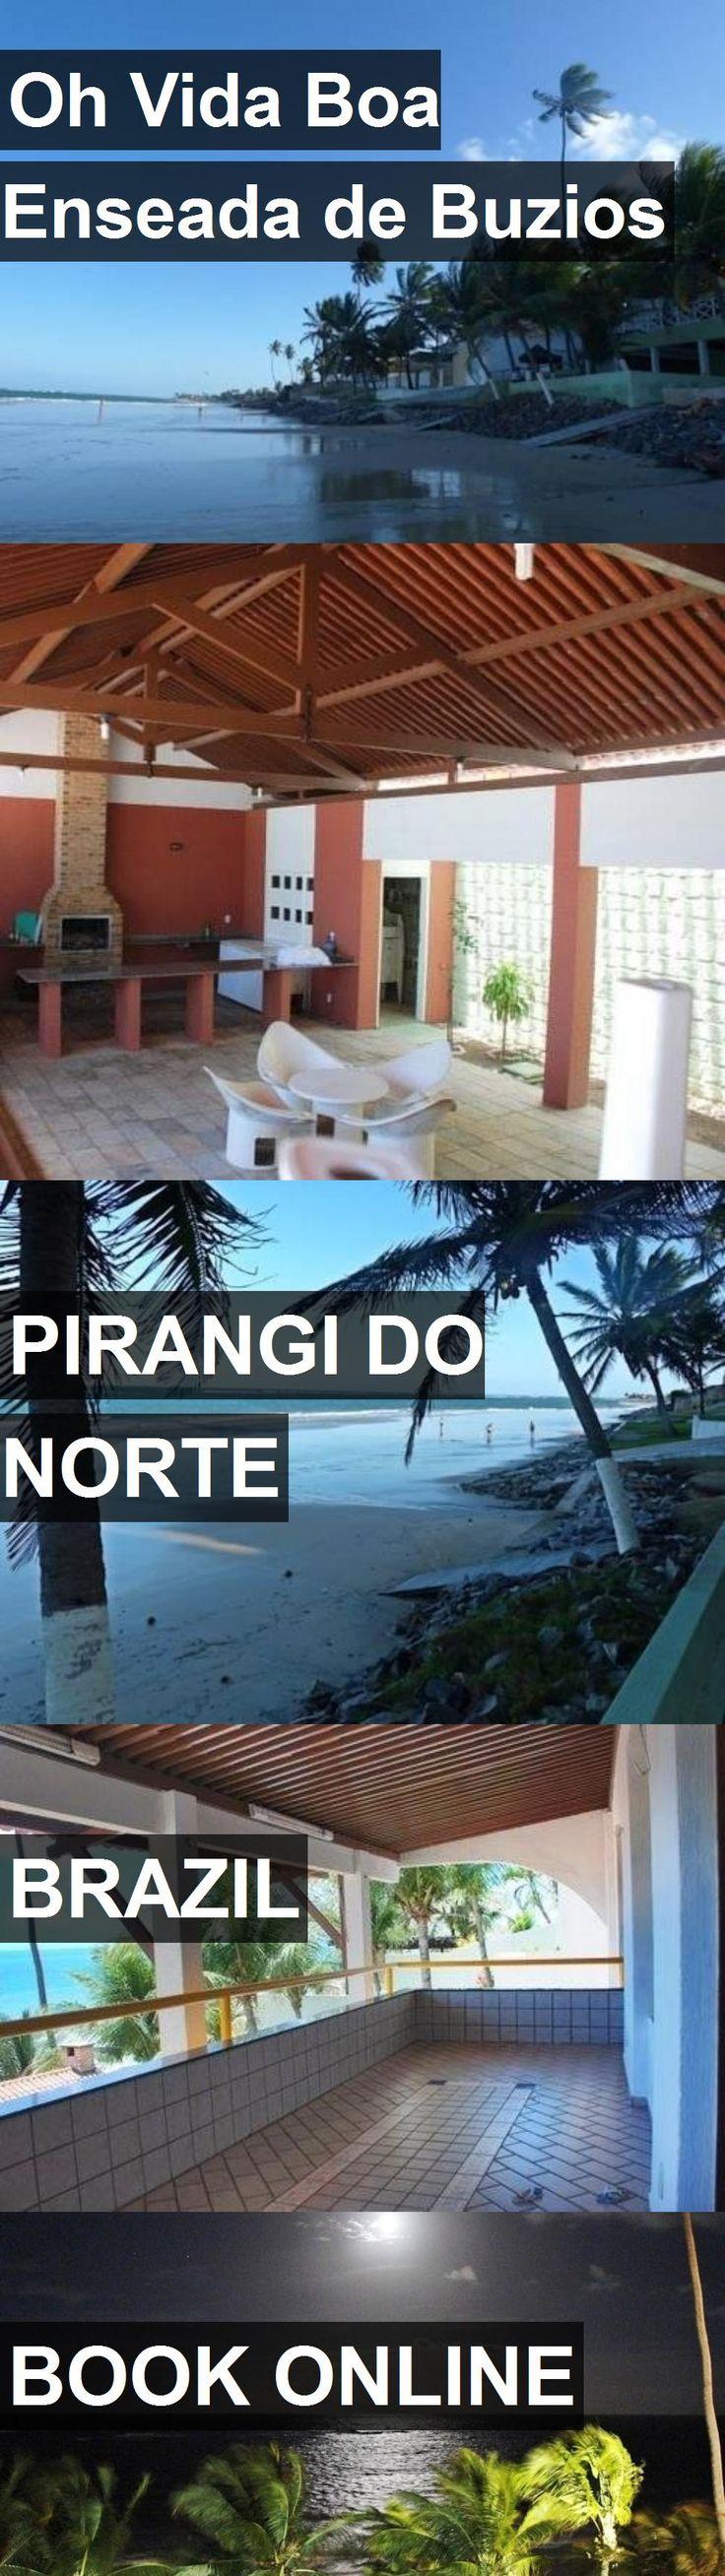 Hotel Oh Vida Boa Enseada de Buzios in Pirangi do Norte, Brazil. For more information, photos, reviews and best prices please follow the link. #Brazil #PirangidoNorte #hotel #travel #vacation